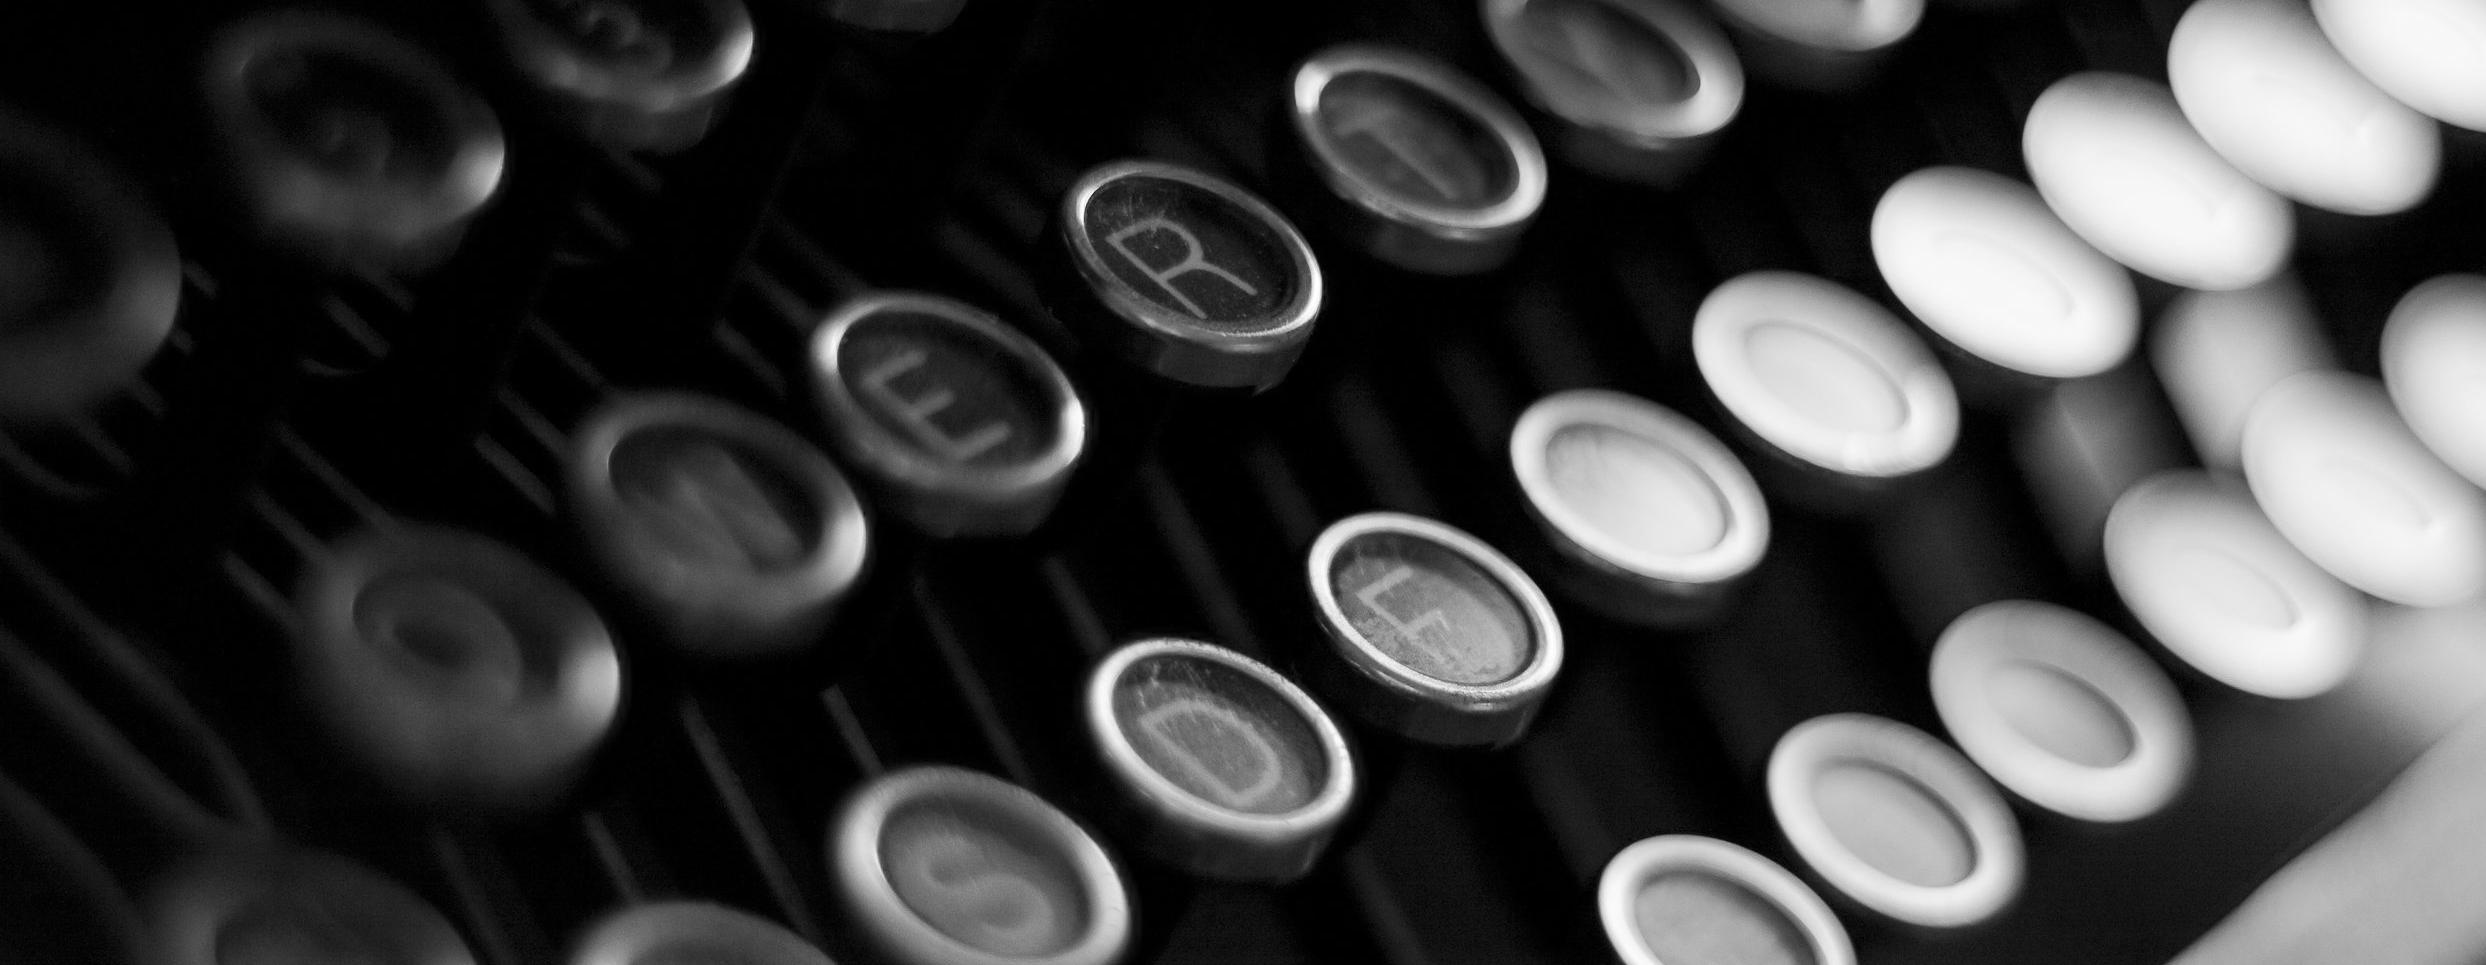 alphabet-black-and-white-blur-938165.jpg